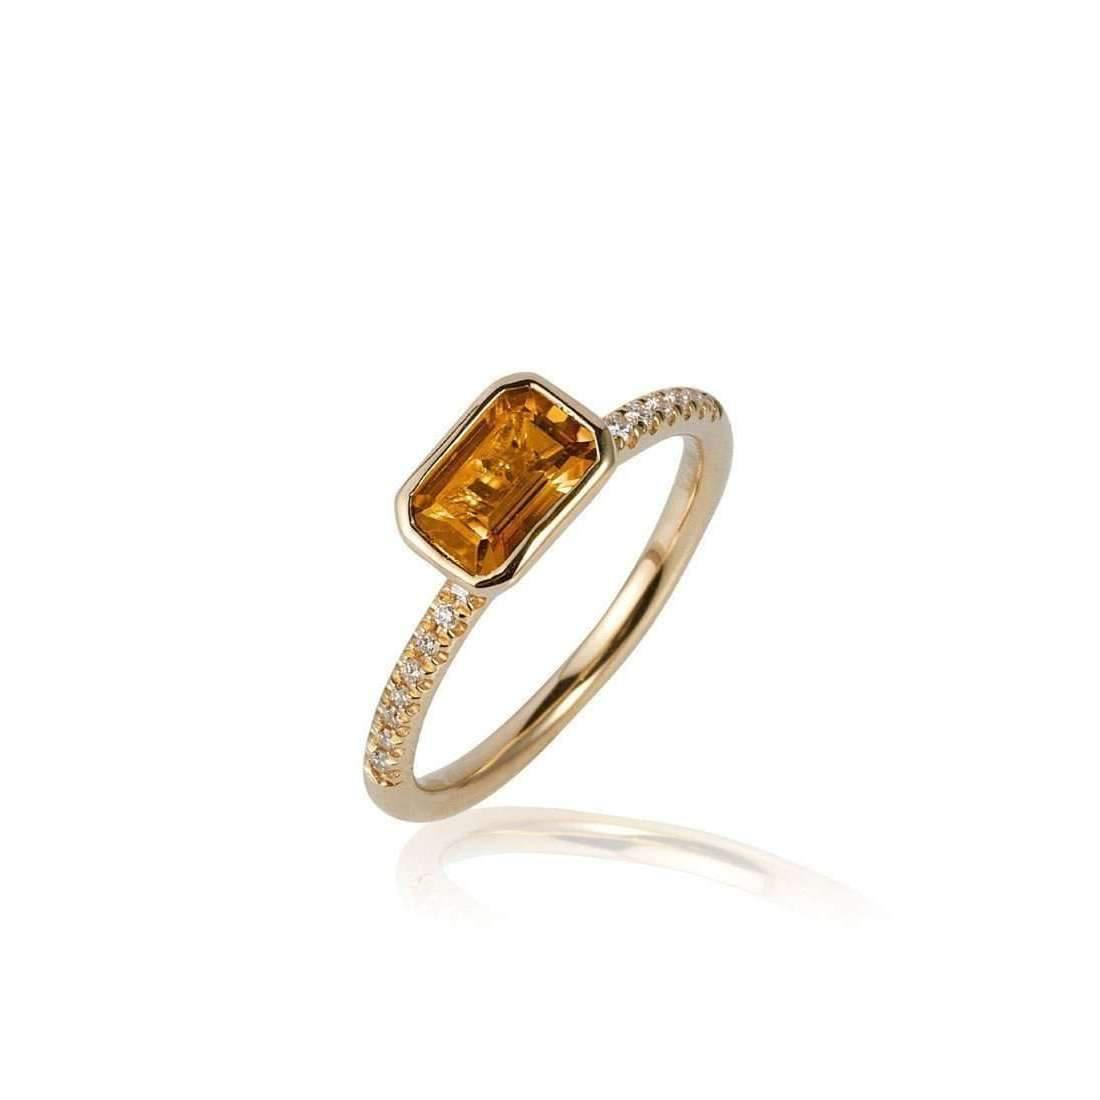 Goshwara Gossip 3 Stone Citrine Emerald Cut Rings - 6.5 (M) vwf1yk